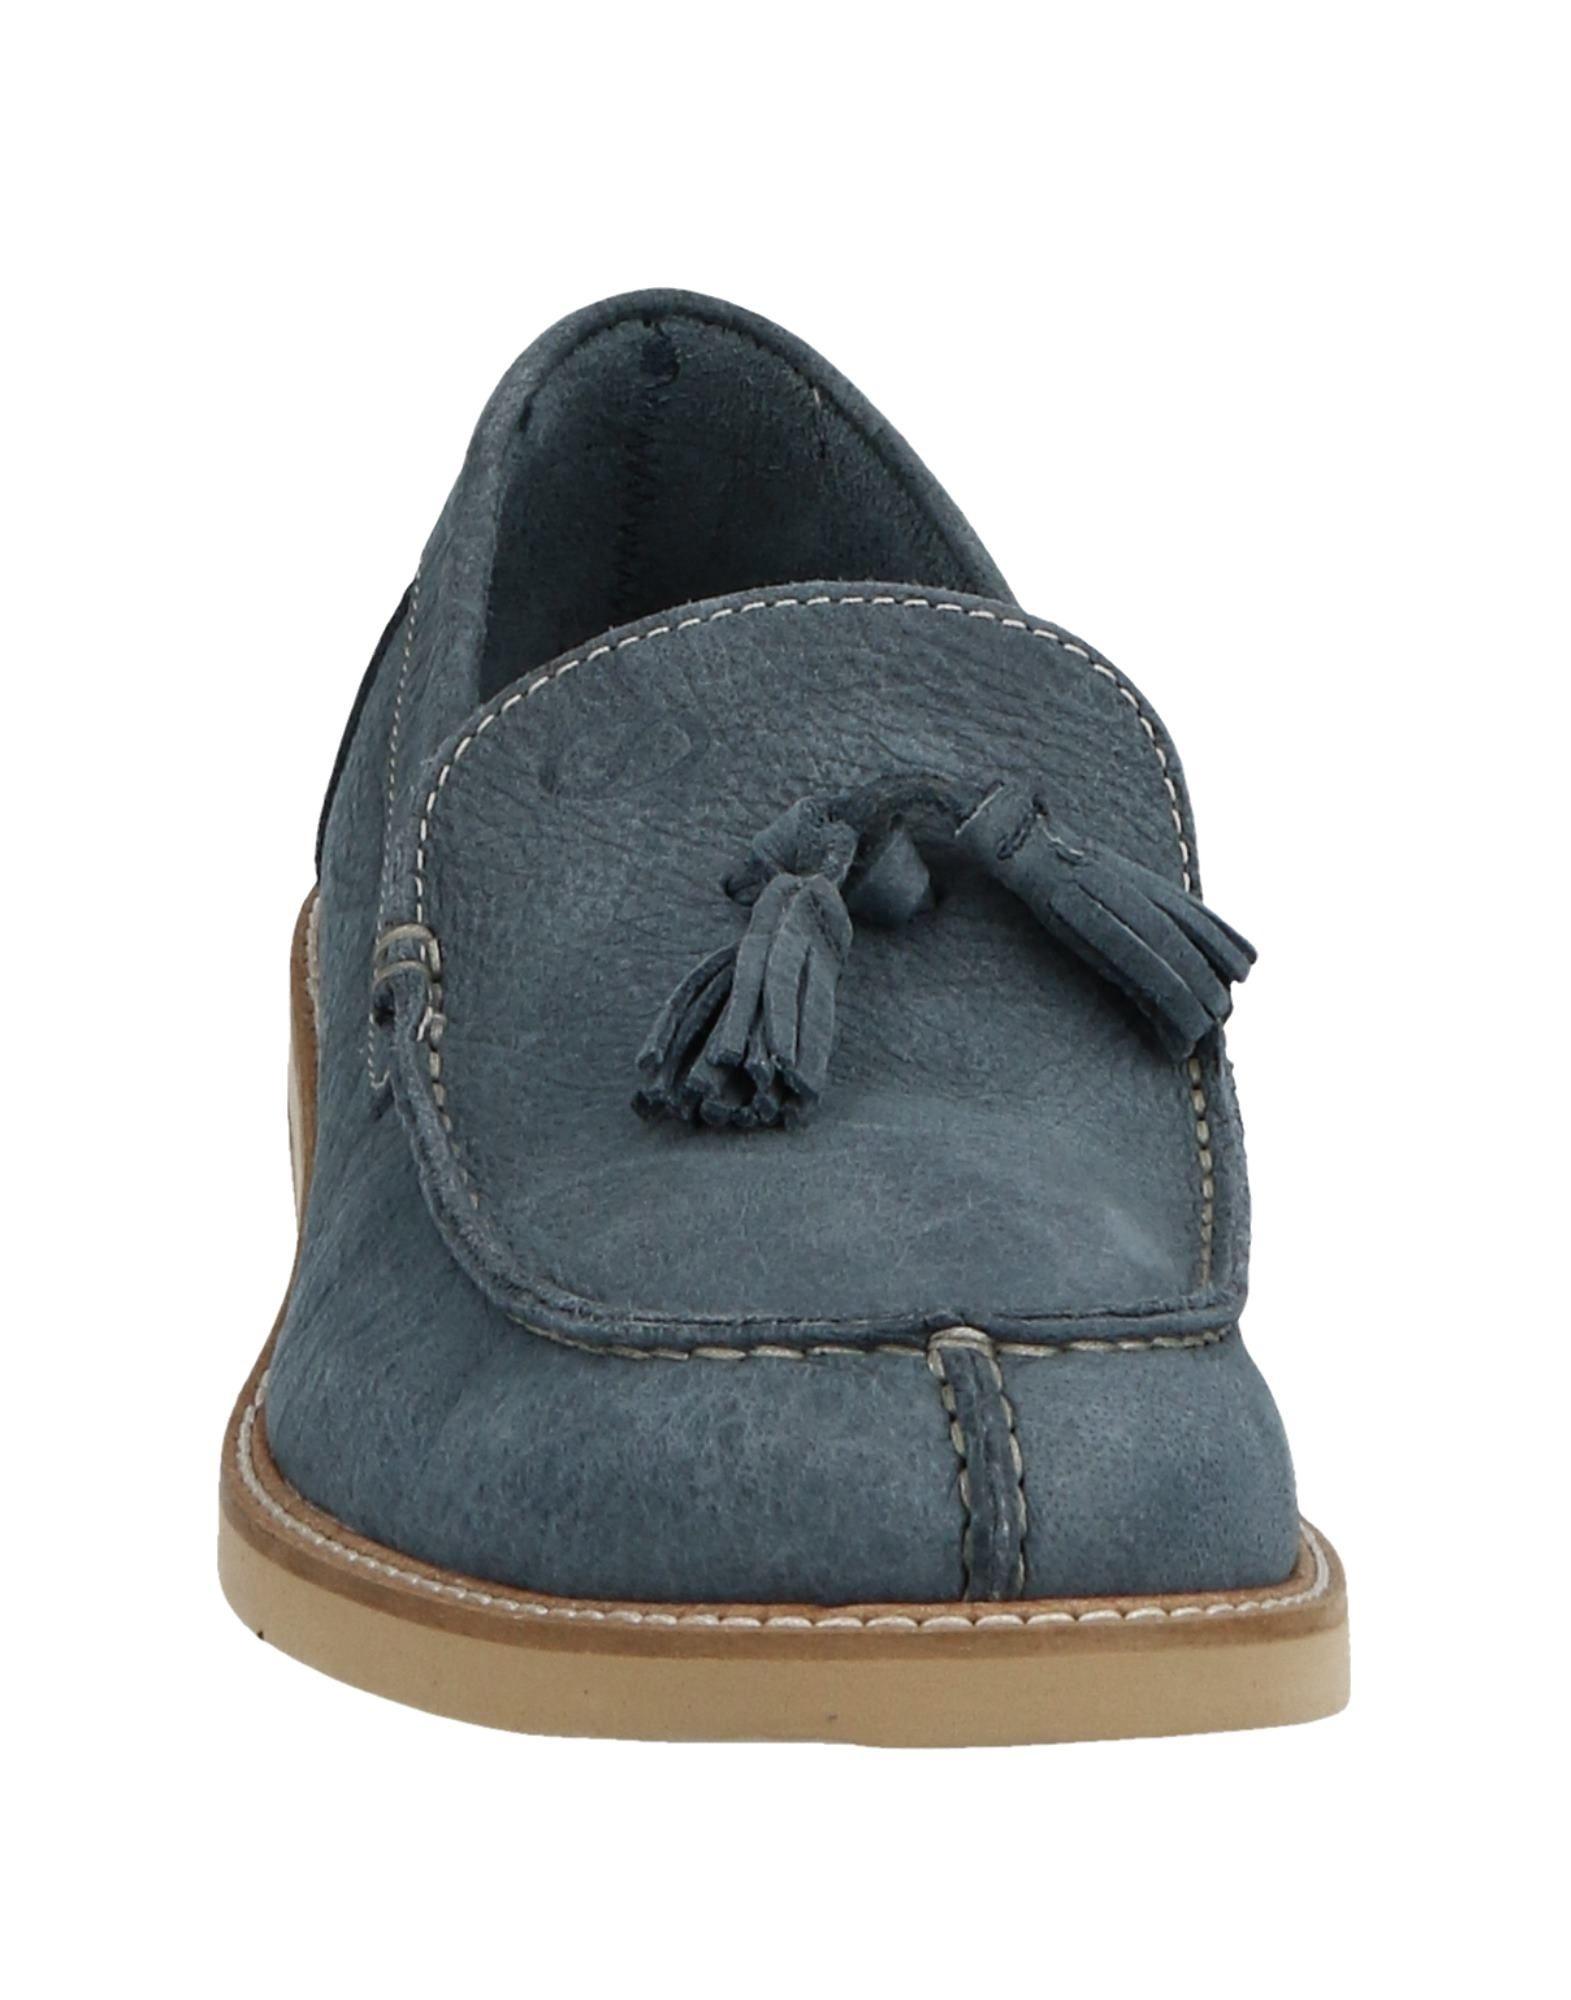 Rabatt echte Schuhe Florsheim Herren Mokassins Herren Florsheim 11506130XS e0e697